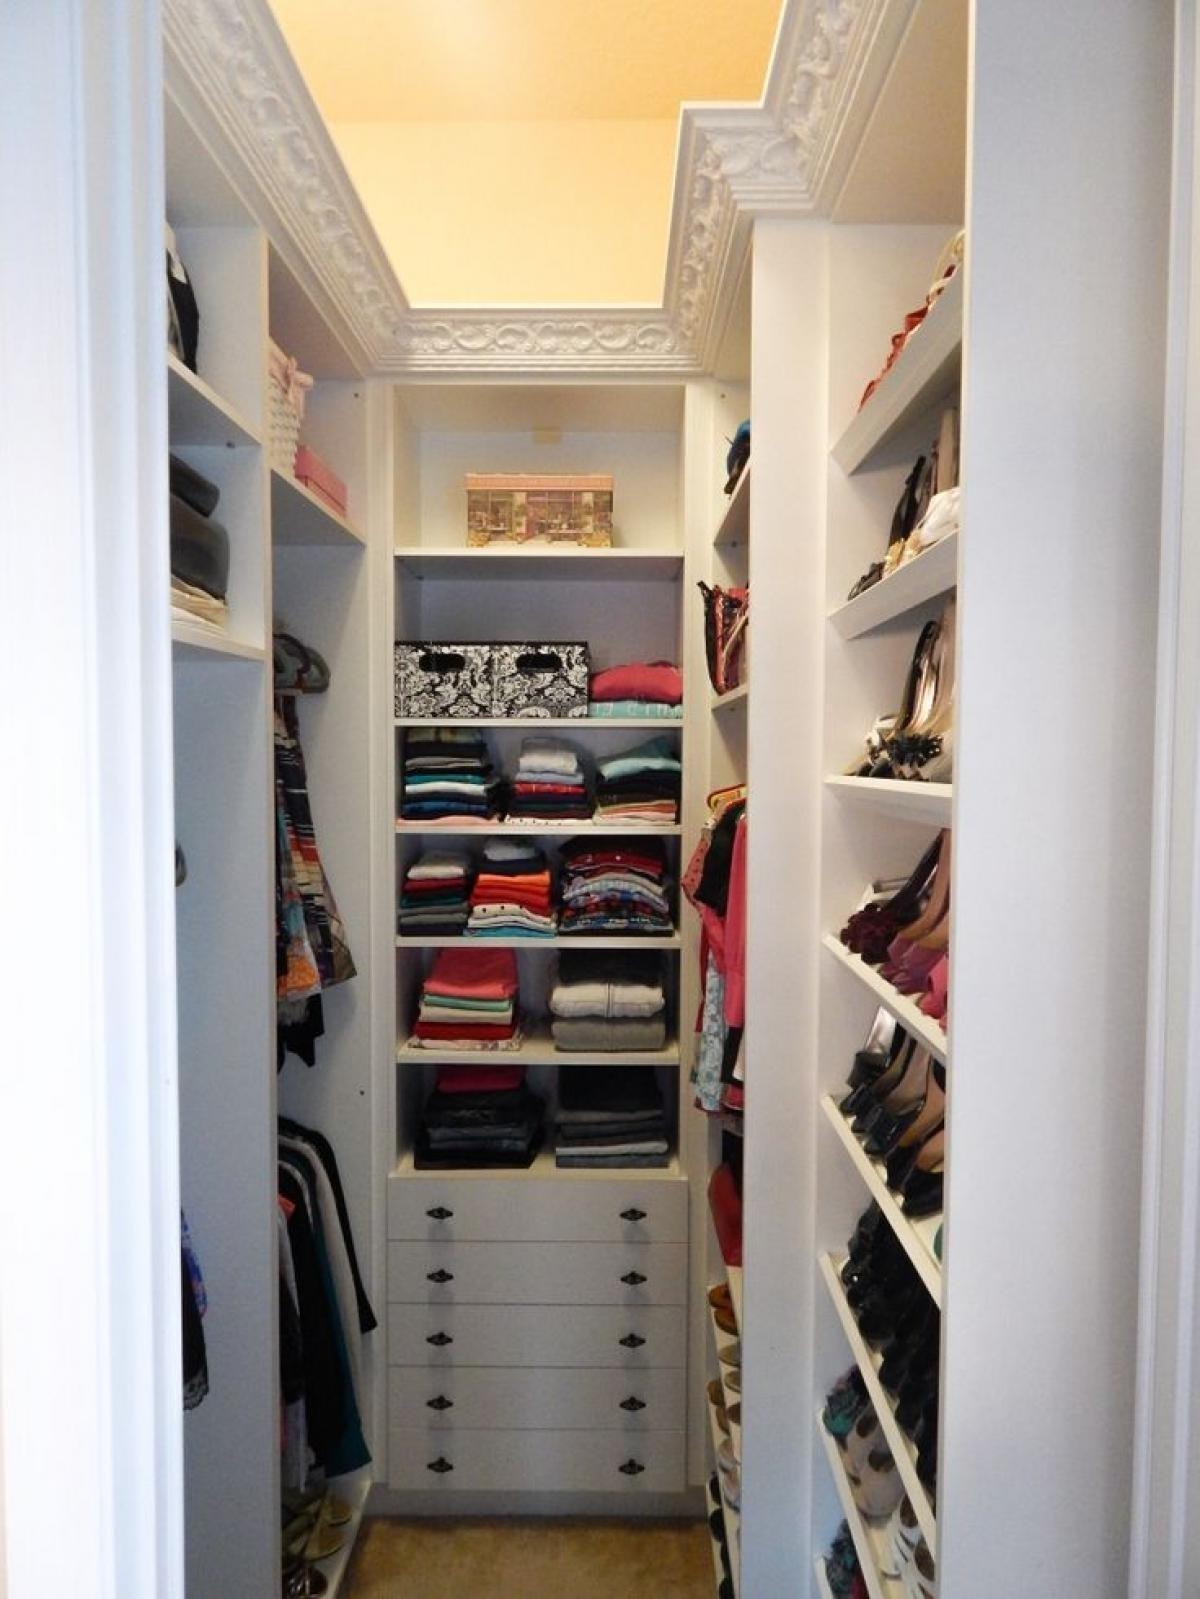 10 Fantastic Small Walk In Closet Design Ideas interior small walk in closet ideas outstanding organization